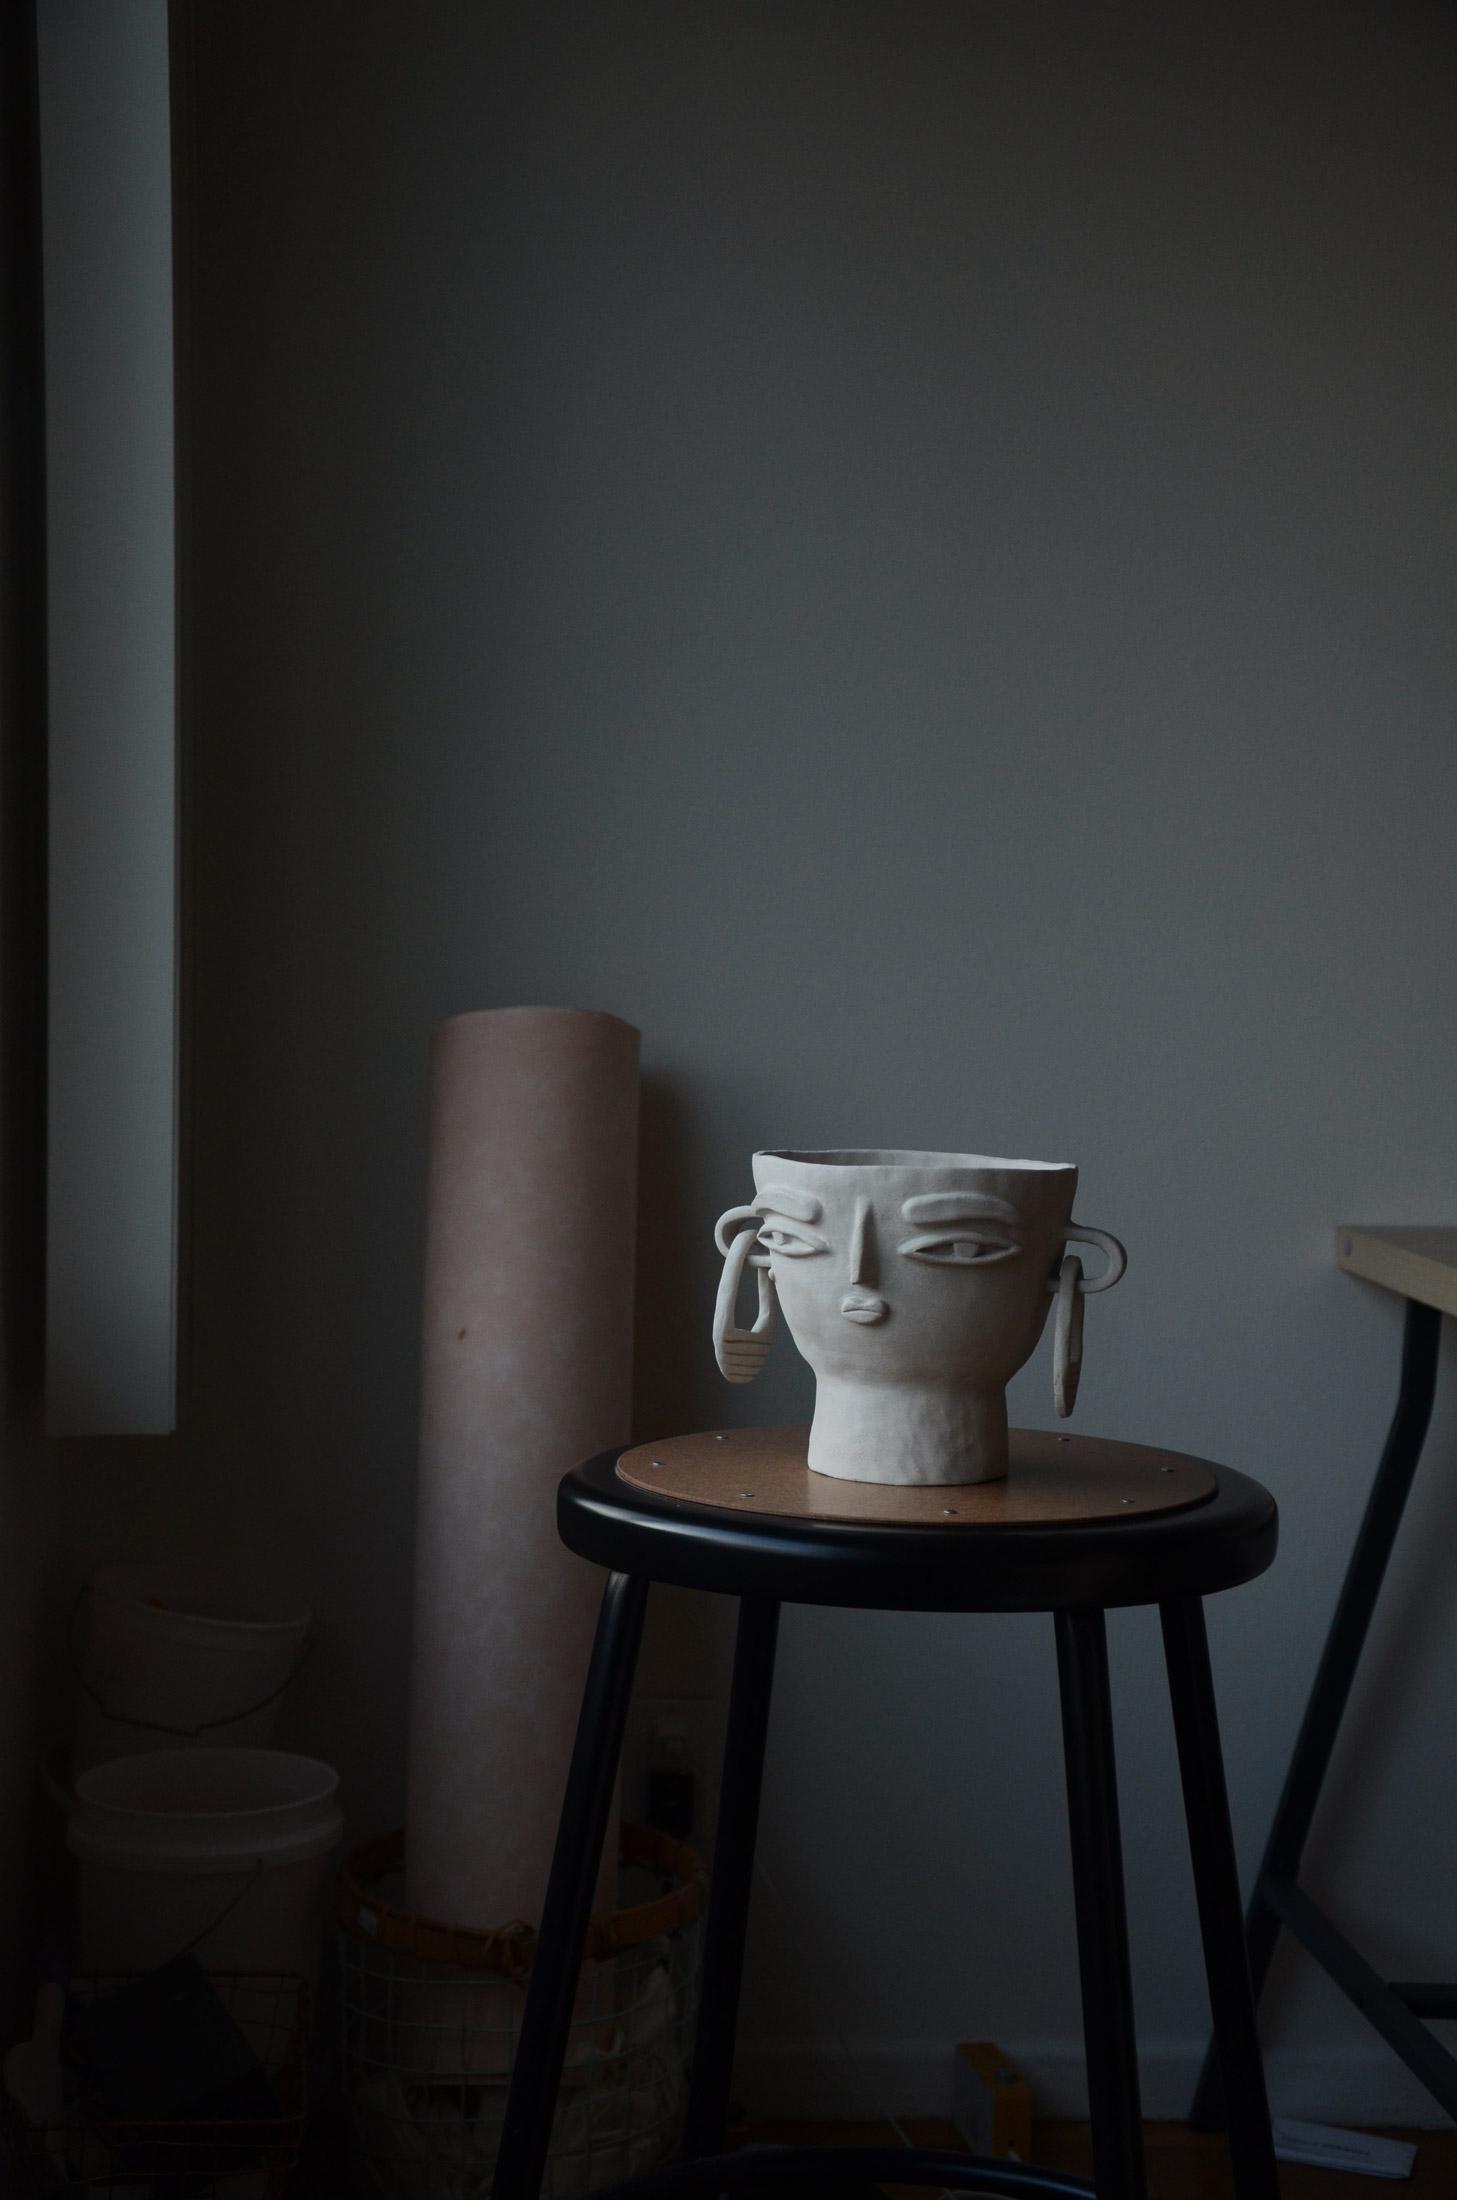 Ceramic vase photography